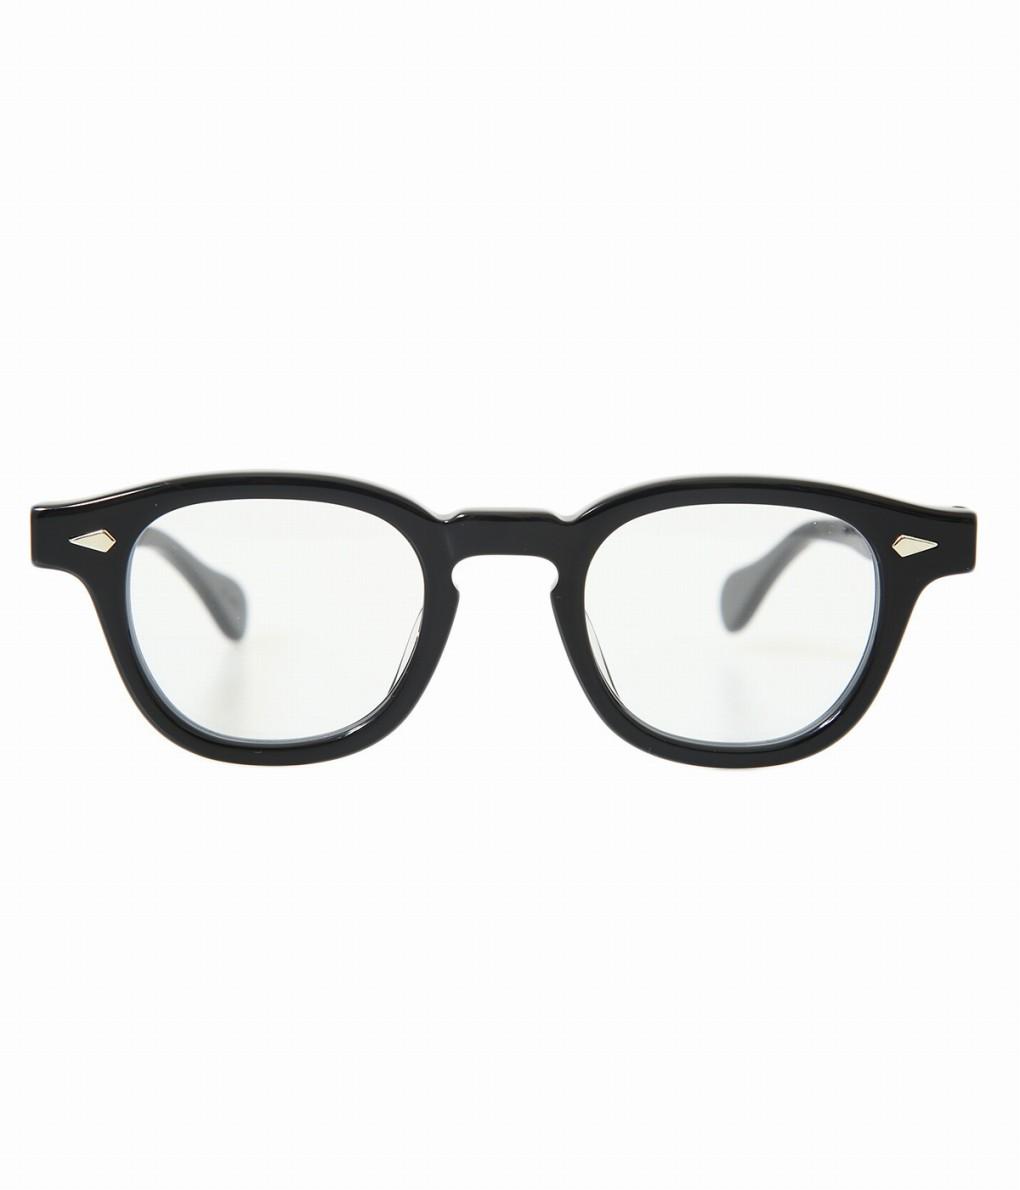 JULIUS TART OPTICAL / ジュリアスタートオプティカル : AR 42(size) 44(size) 46(size) - BLACK / CLEAR - : サングラス アクセサリー メガネ 眼鏡 : JTPL-009A-1A-2A【WIS】【COR】